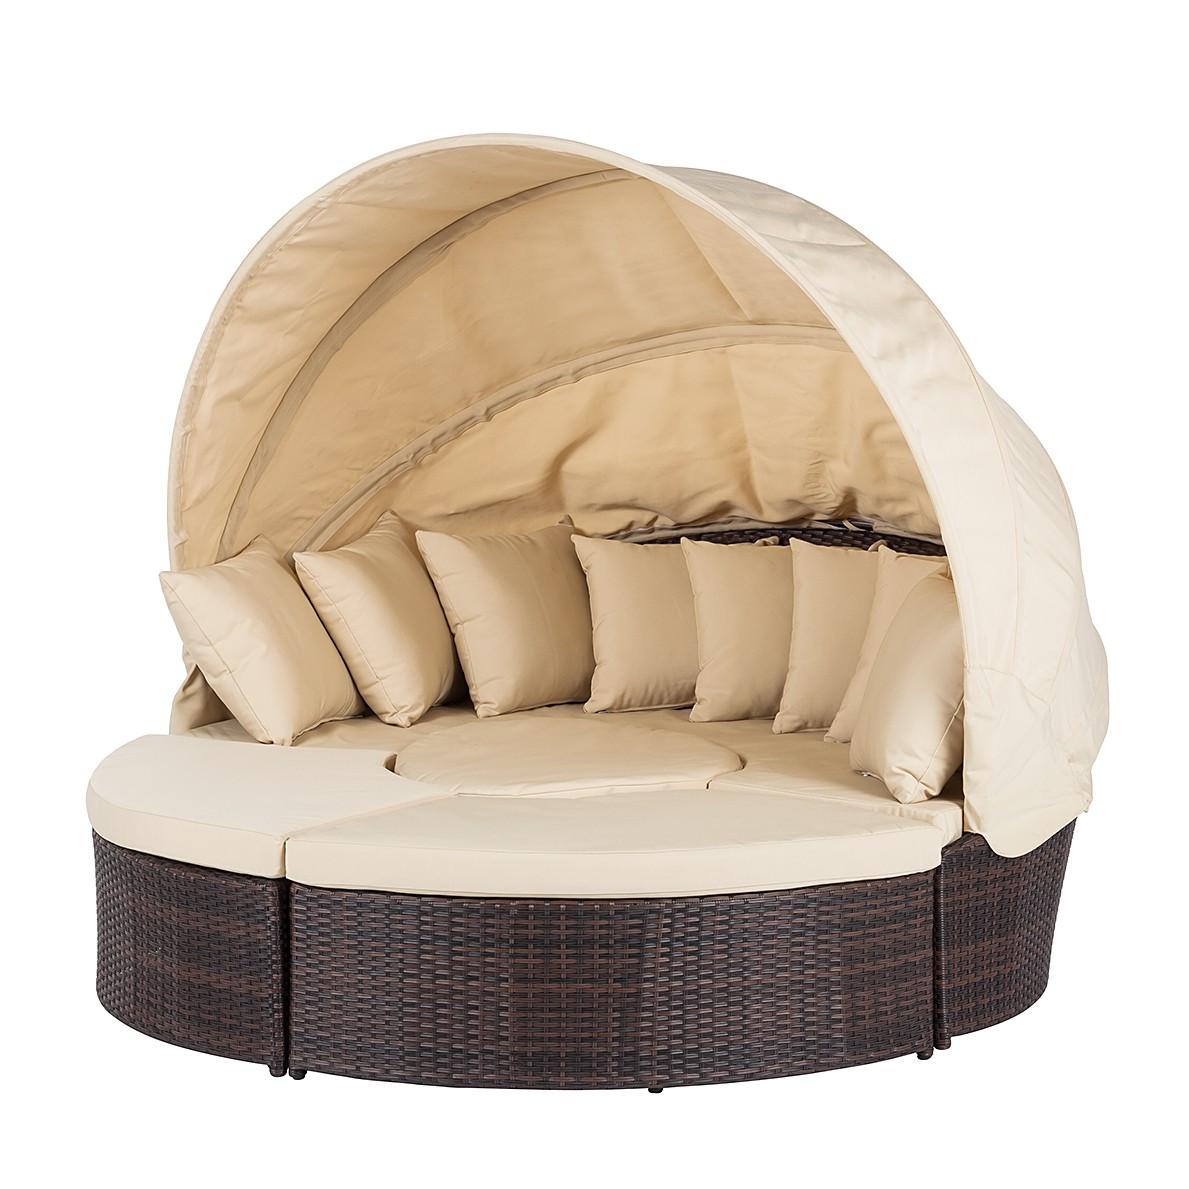 Premium Lounge eiland Paradise Lounge - polyrotan - aluminium frame - Bruin/beige, Fredriks